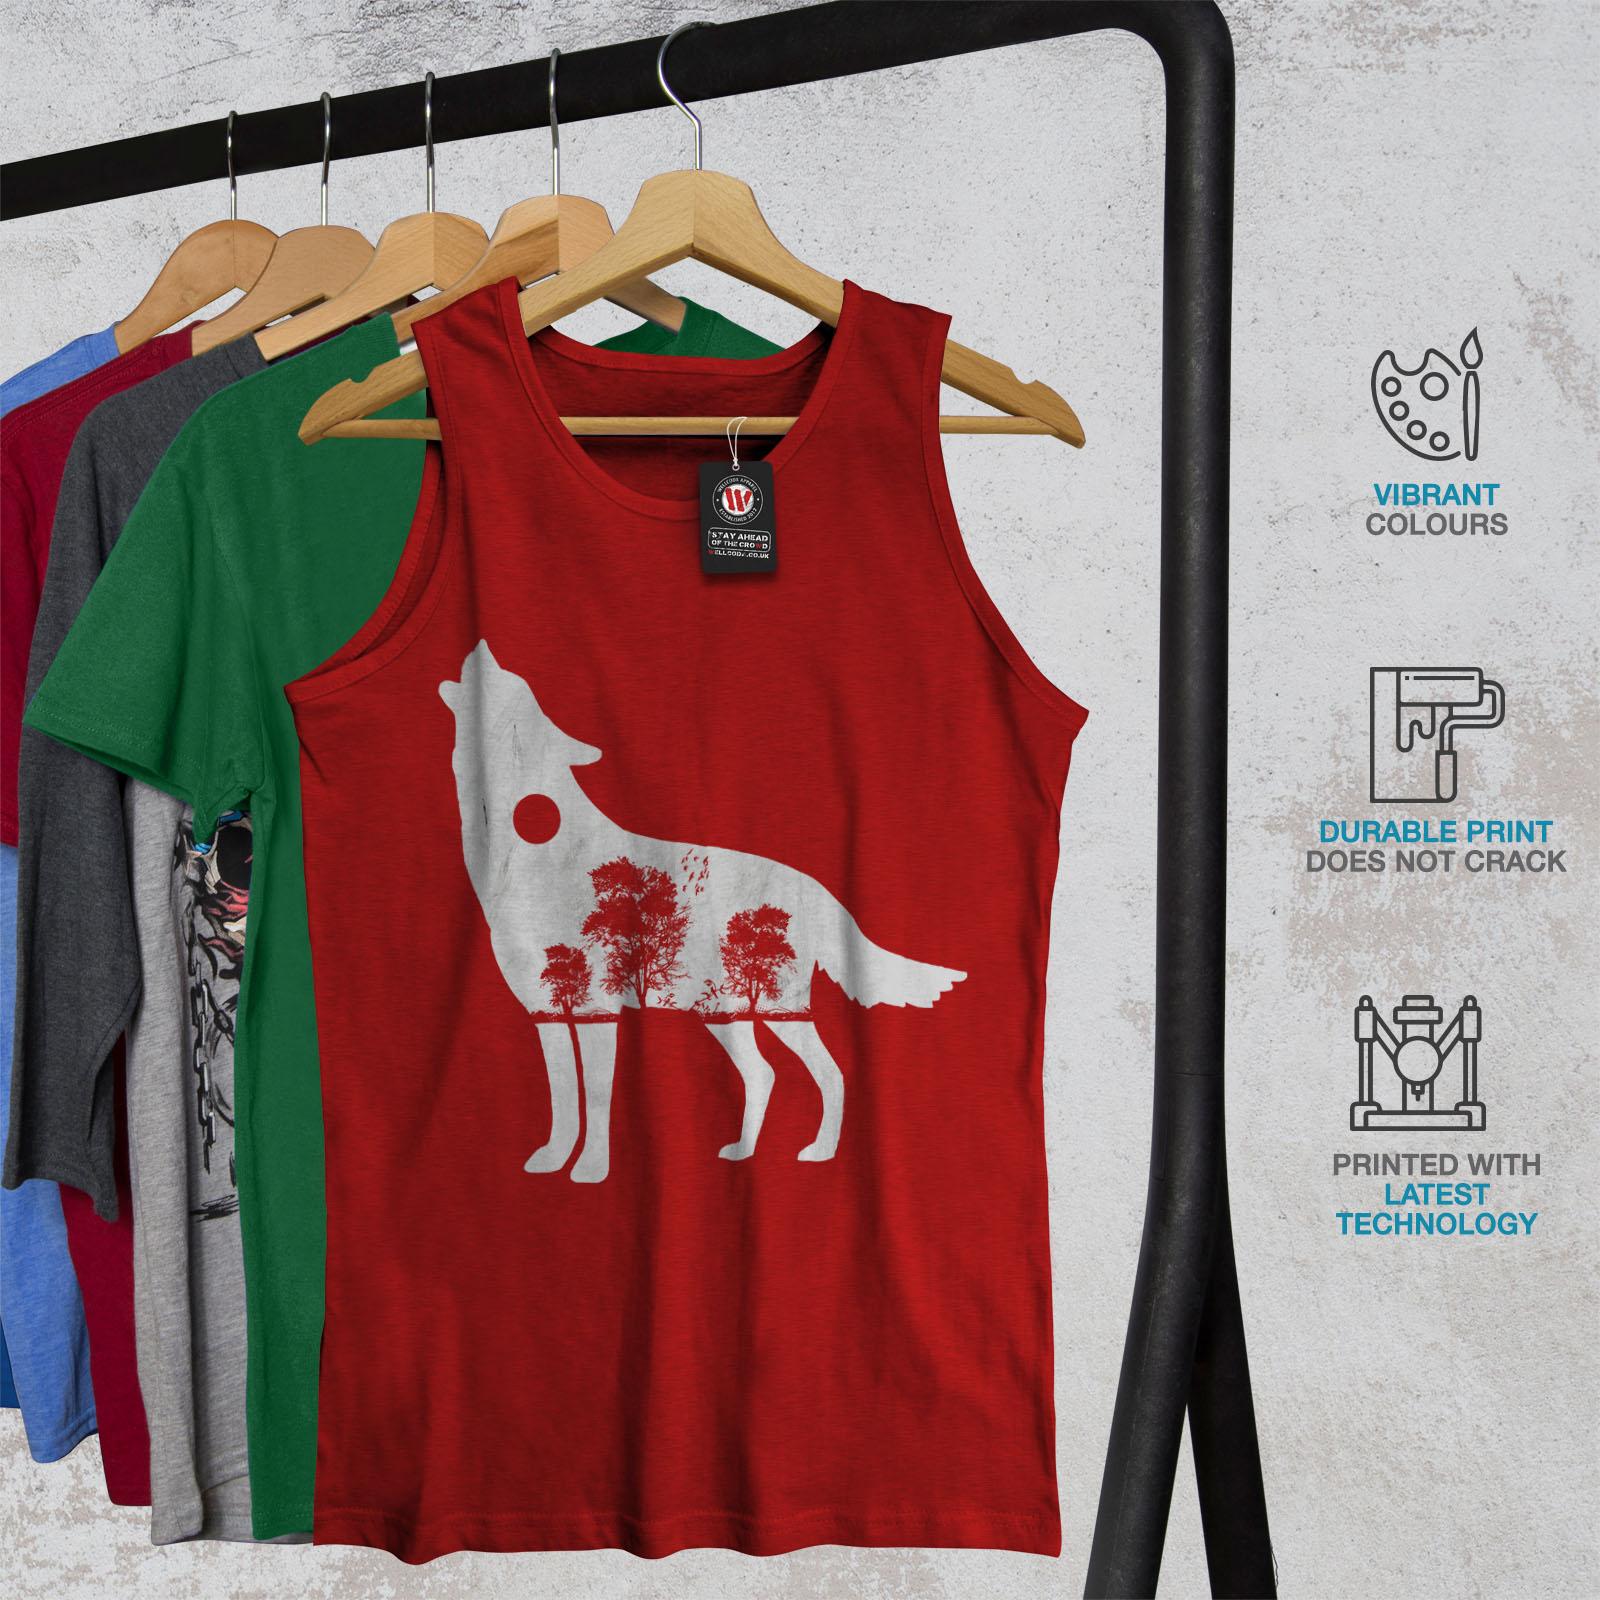 Wellcoda-Wolf-Wald-Tier-Herren-Tank-Top-Baum-Active-Sportshirt Indexbild 8